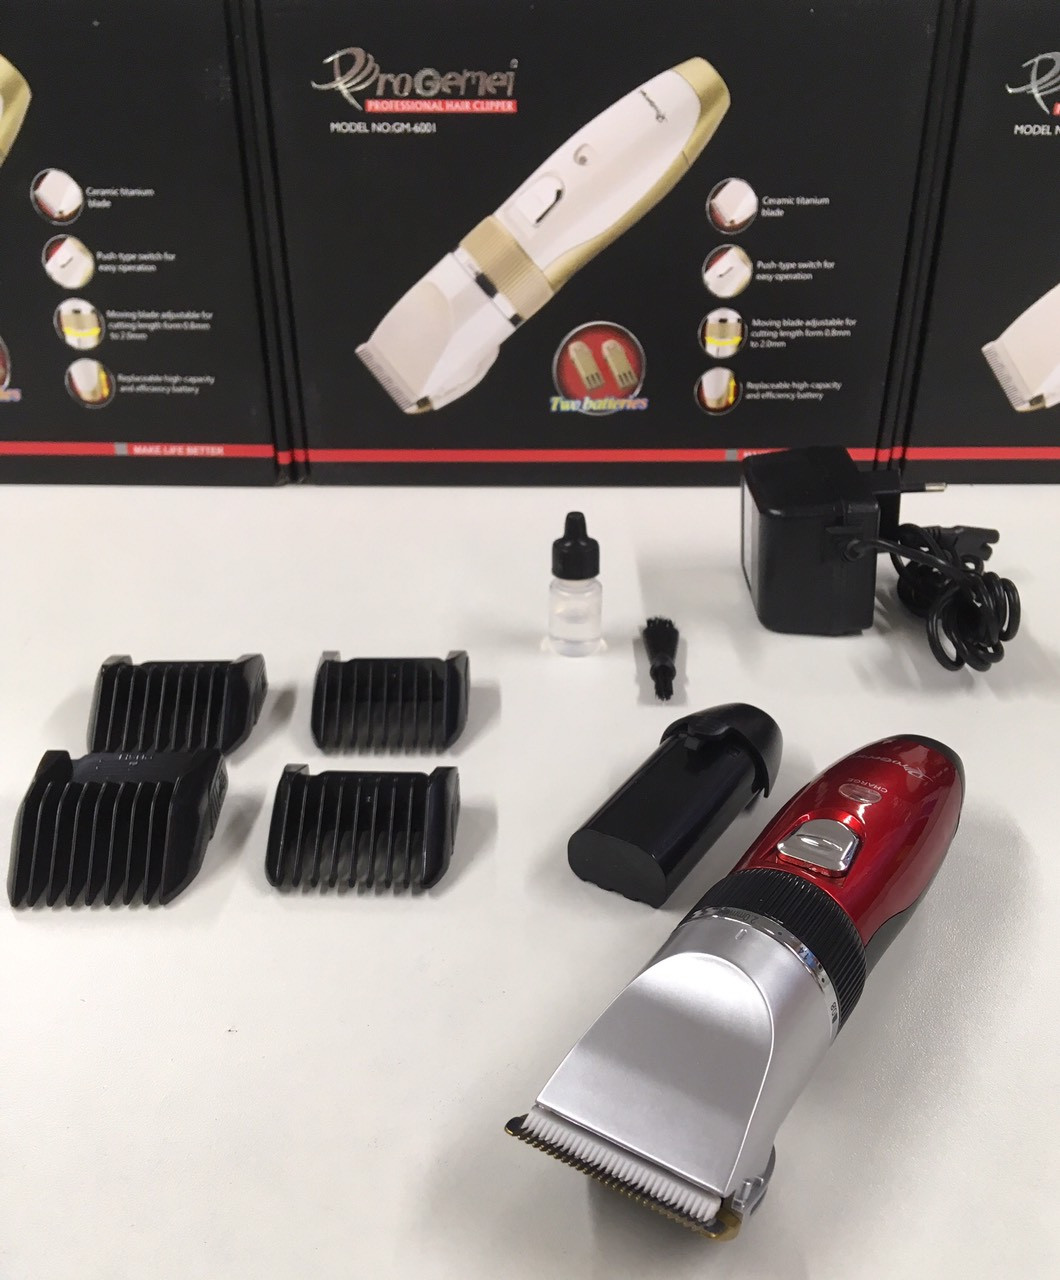 Машинка для стрижки волос ProGemei GM-6001 2 аккумулятора